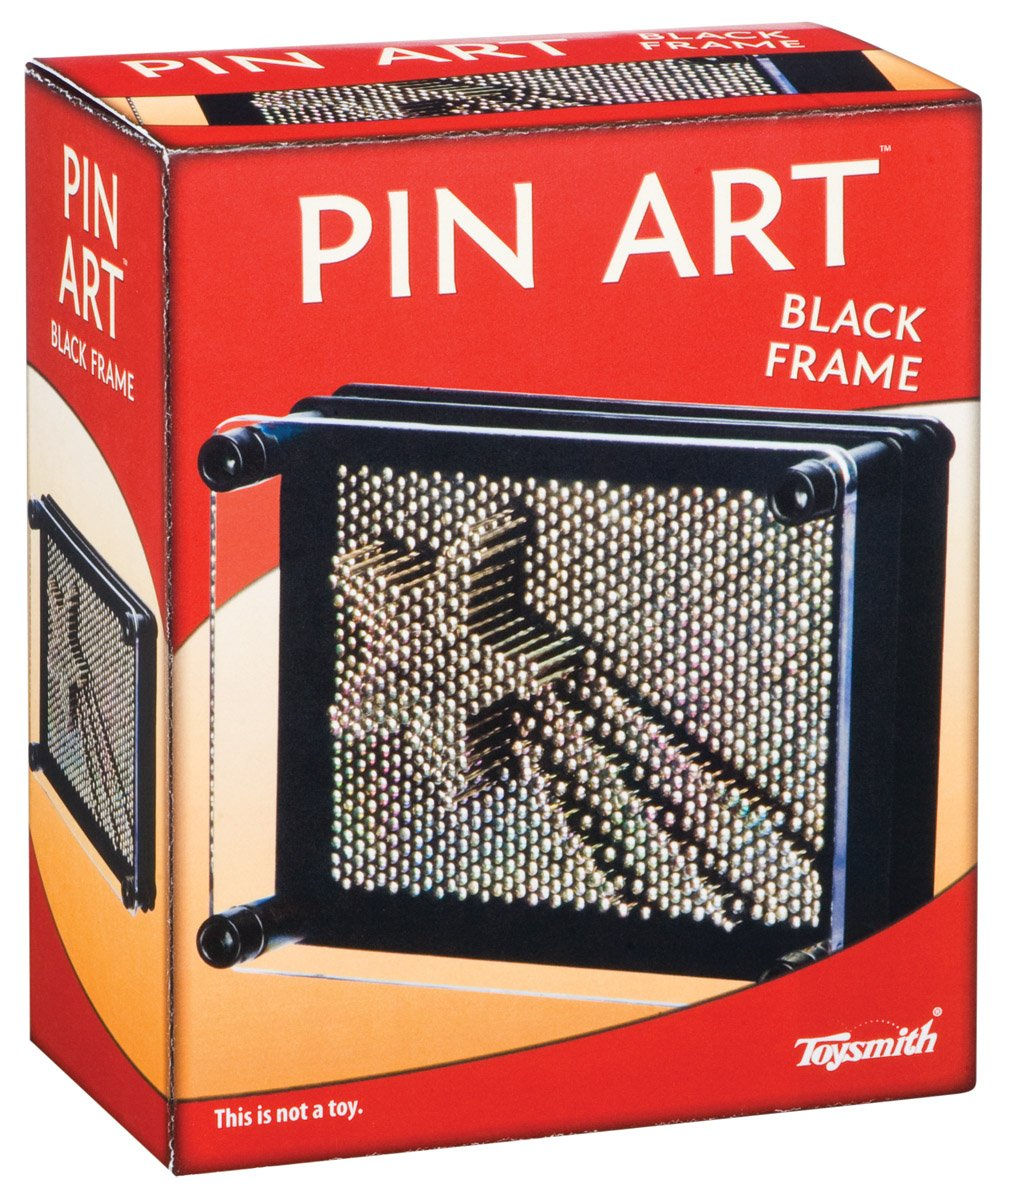 Toysmith Pin Art (Black Frame 3.75-Inch x 5-Inch) 1092